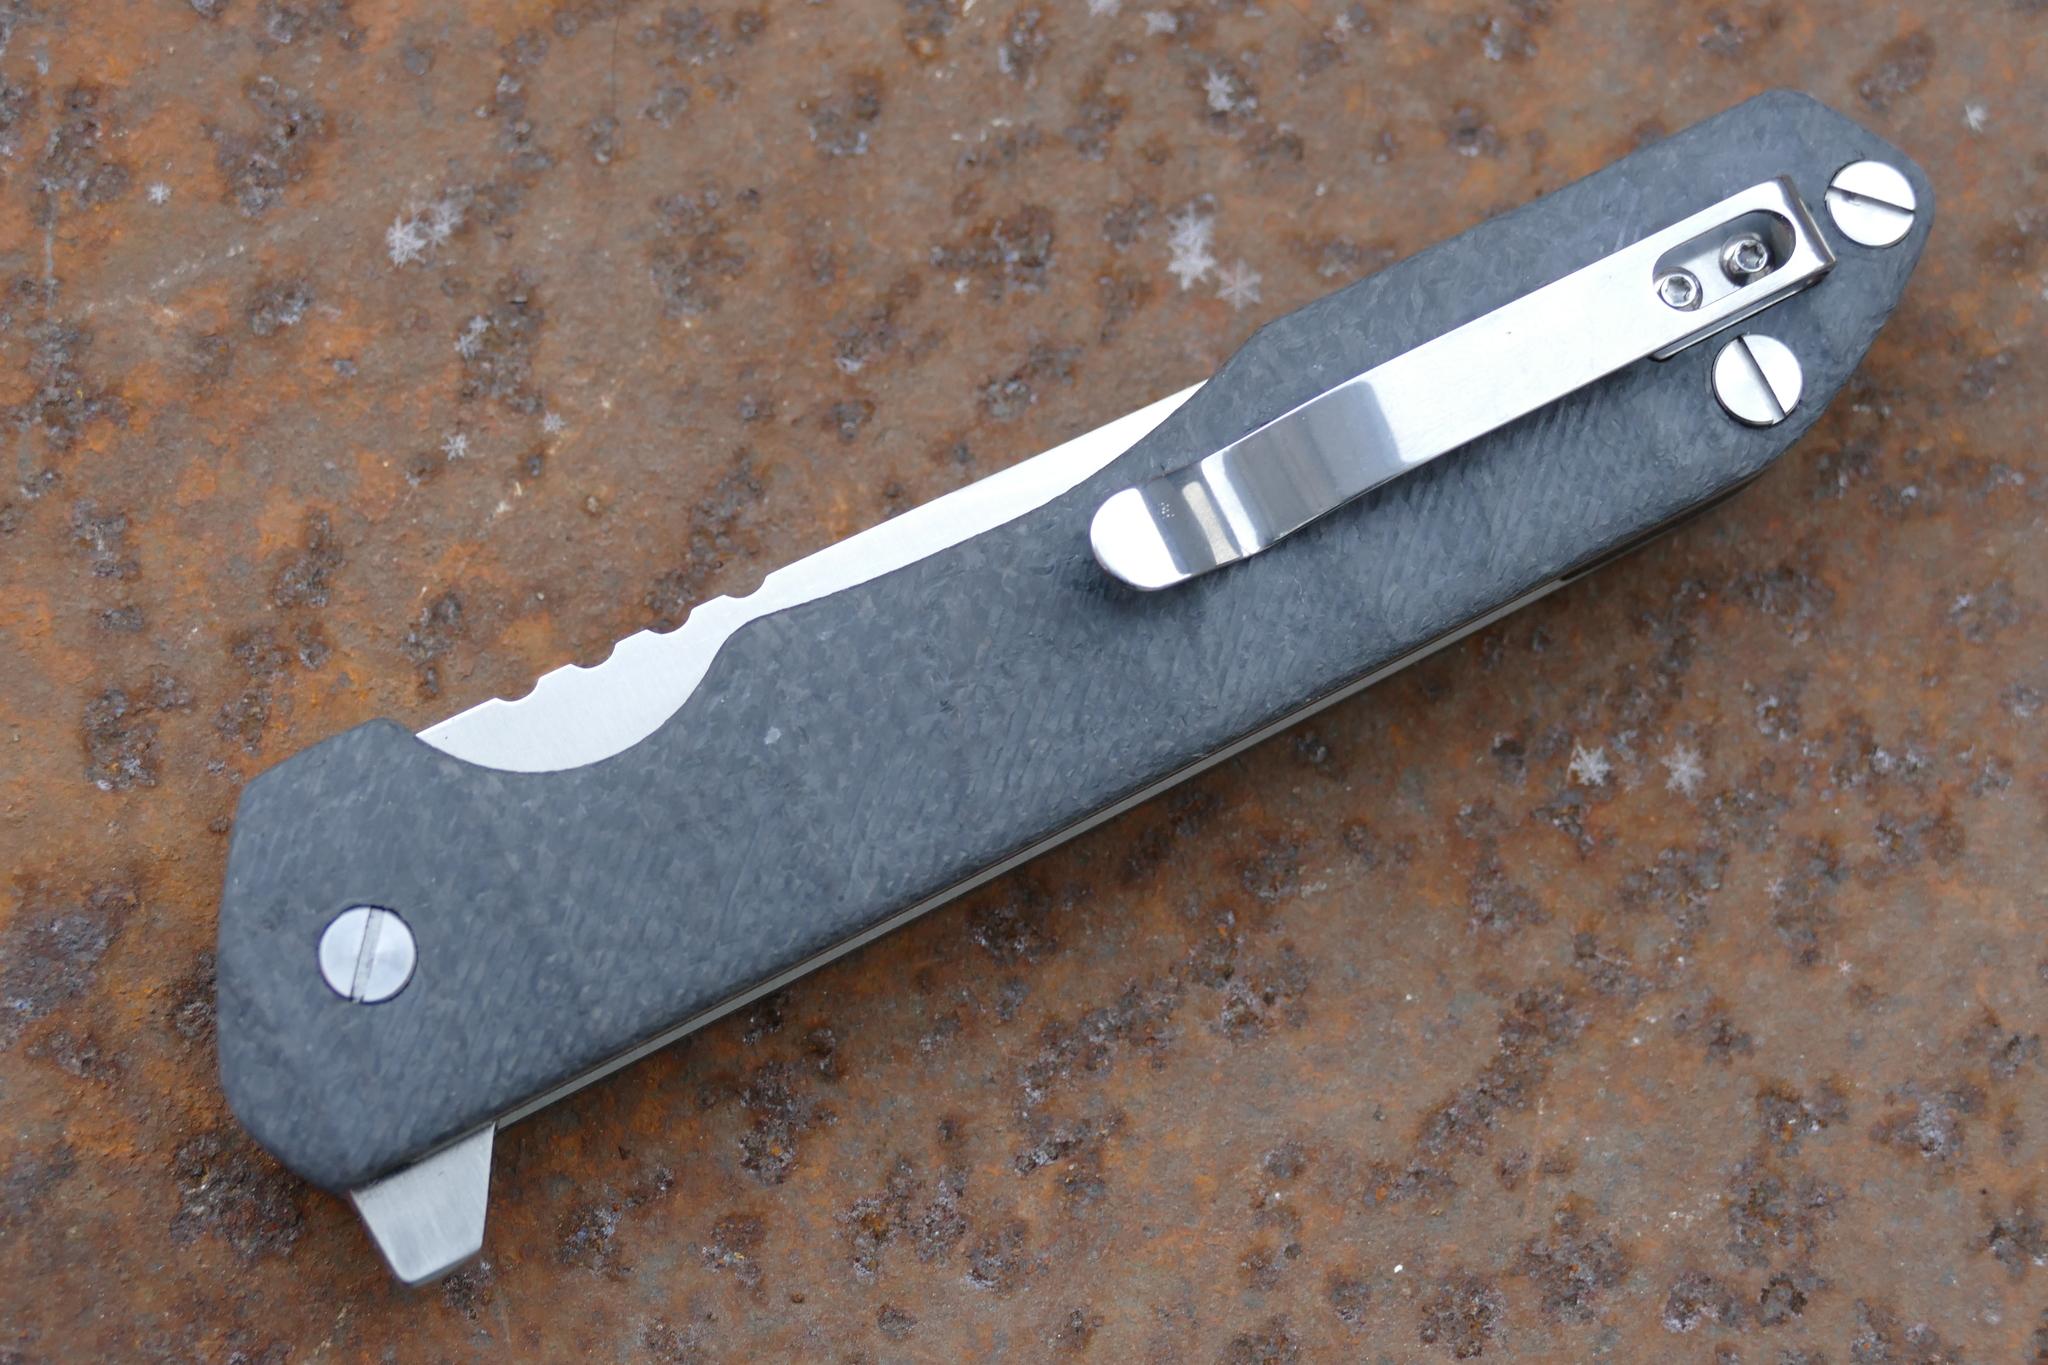 Фото 20 - Складной нож Rassenti 3, D2 от Steelclaw